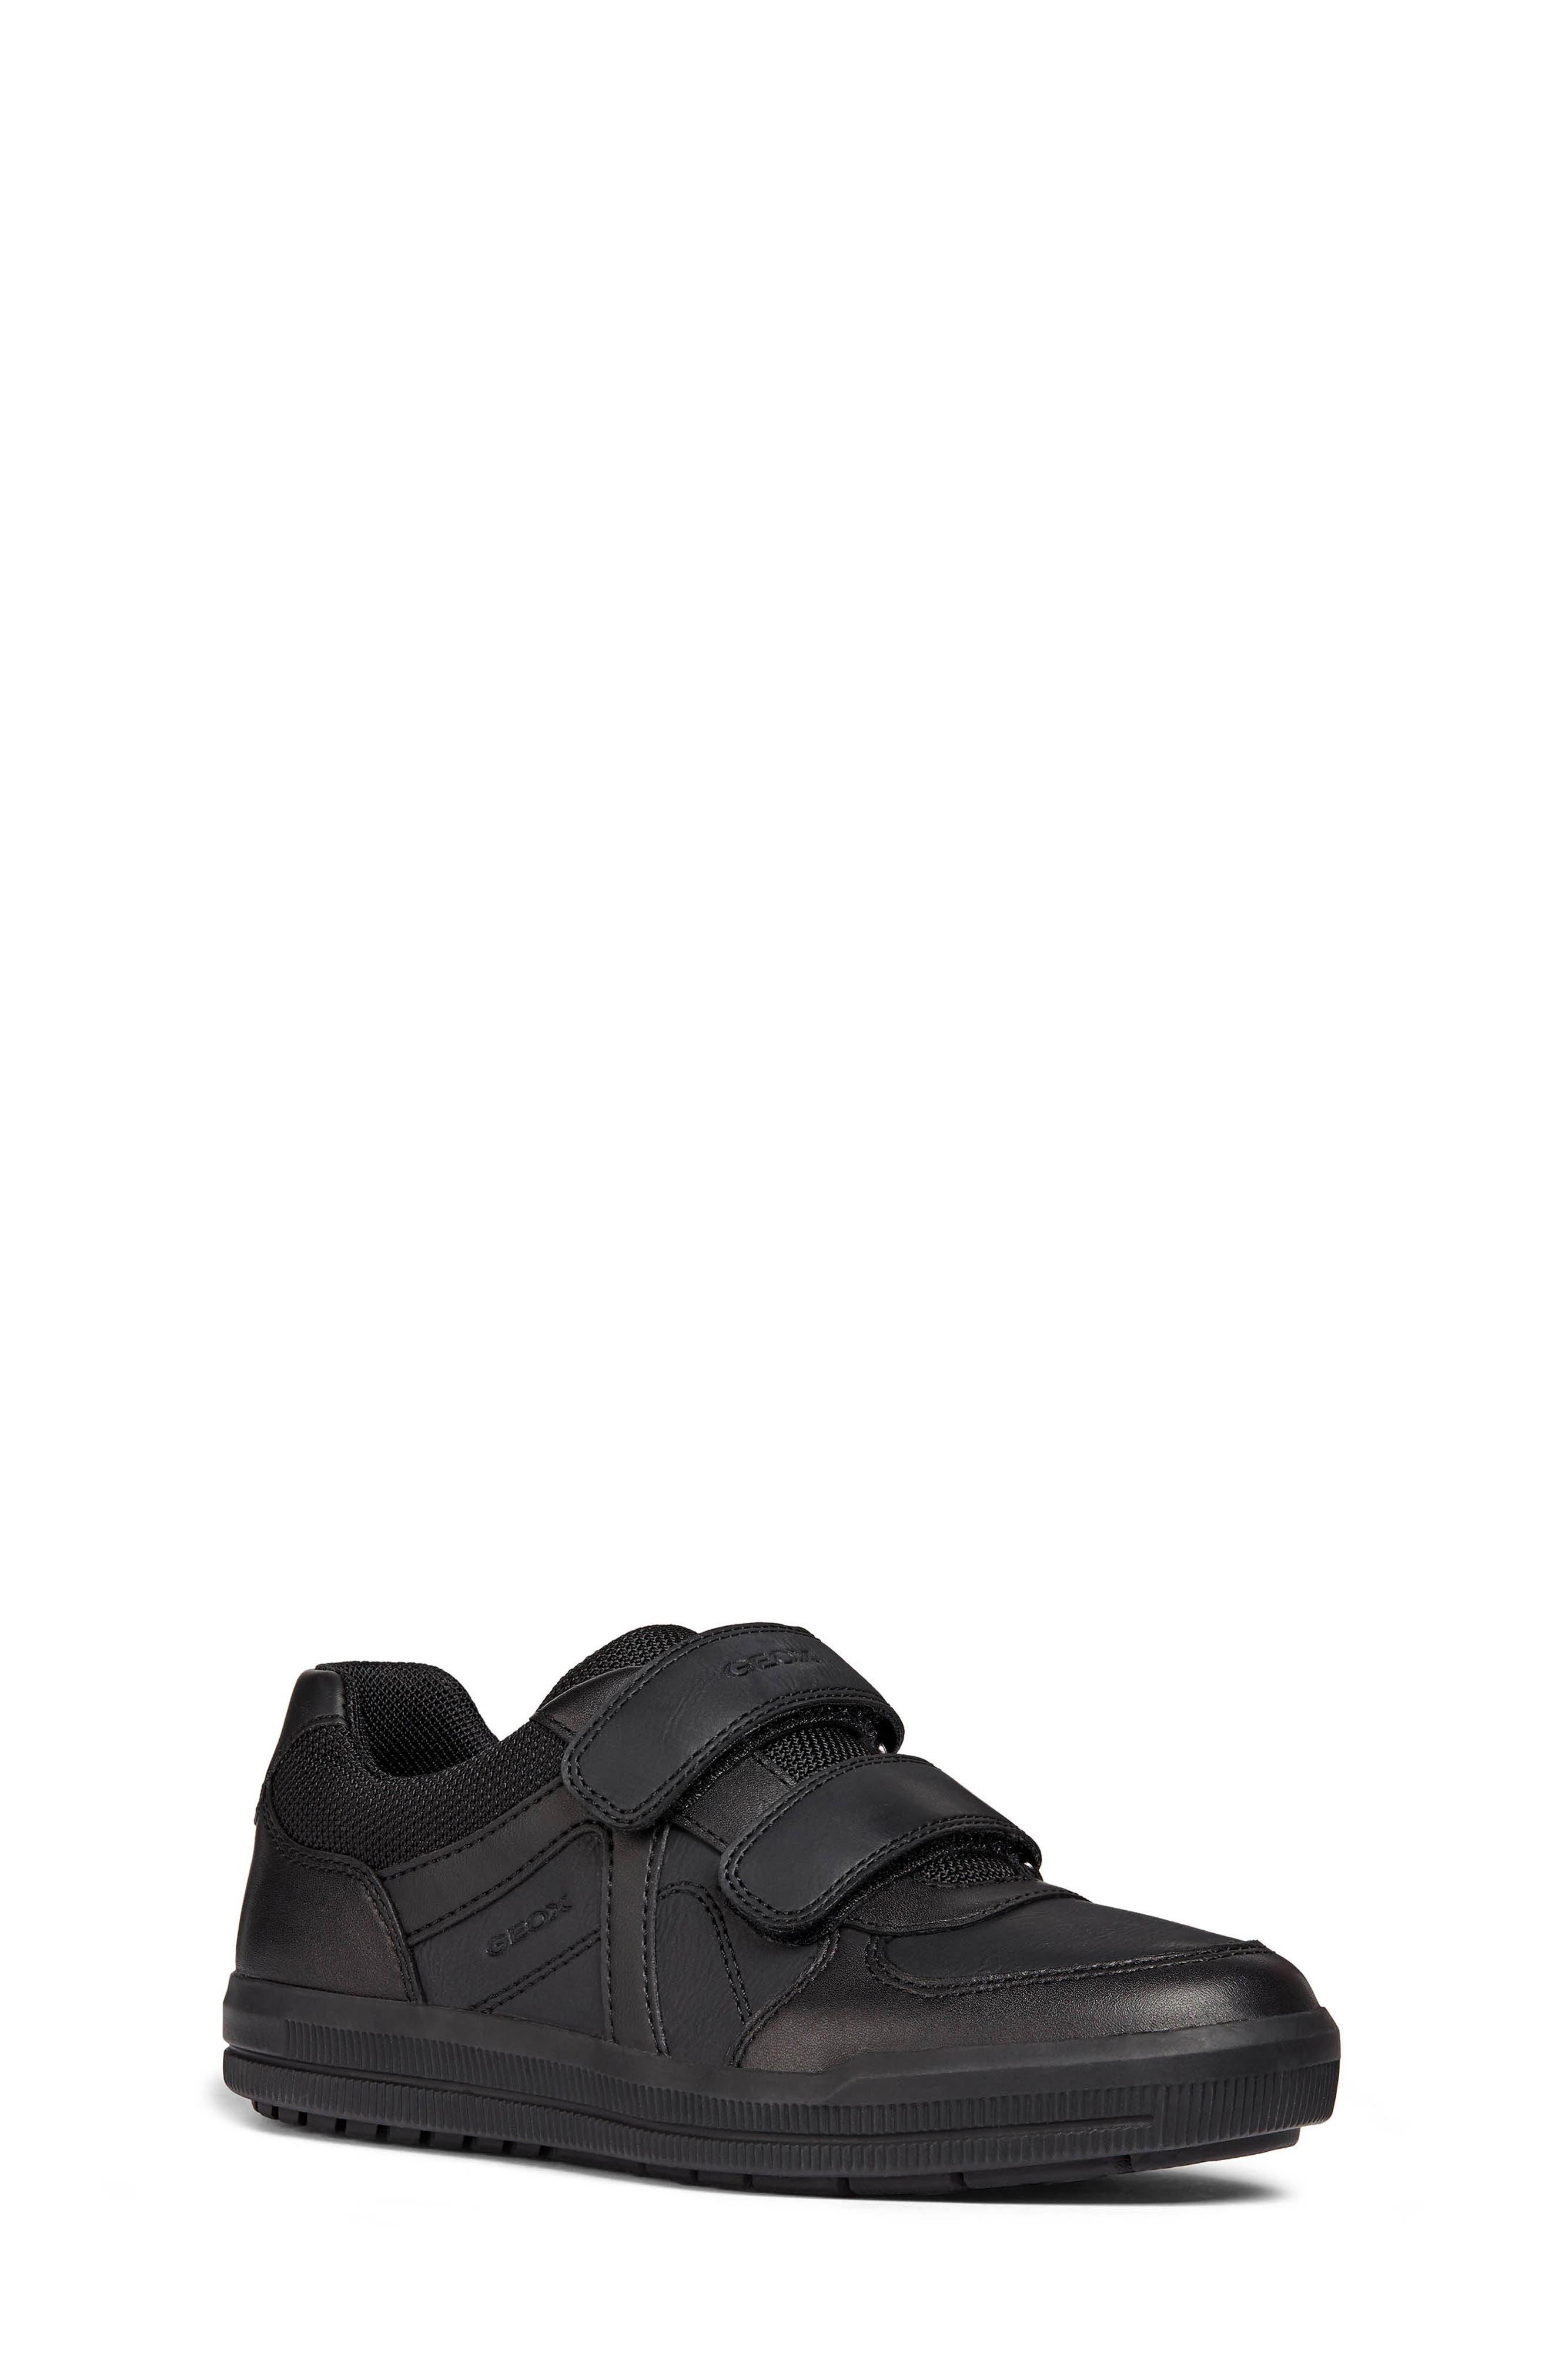 Arzach Sneaker,                             Main thumbnail 1, color,                             BLACK